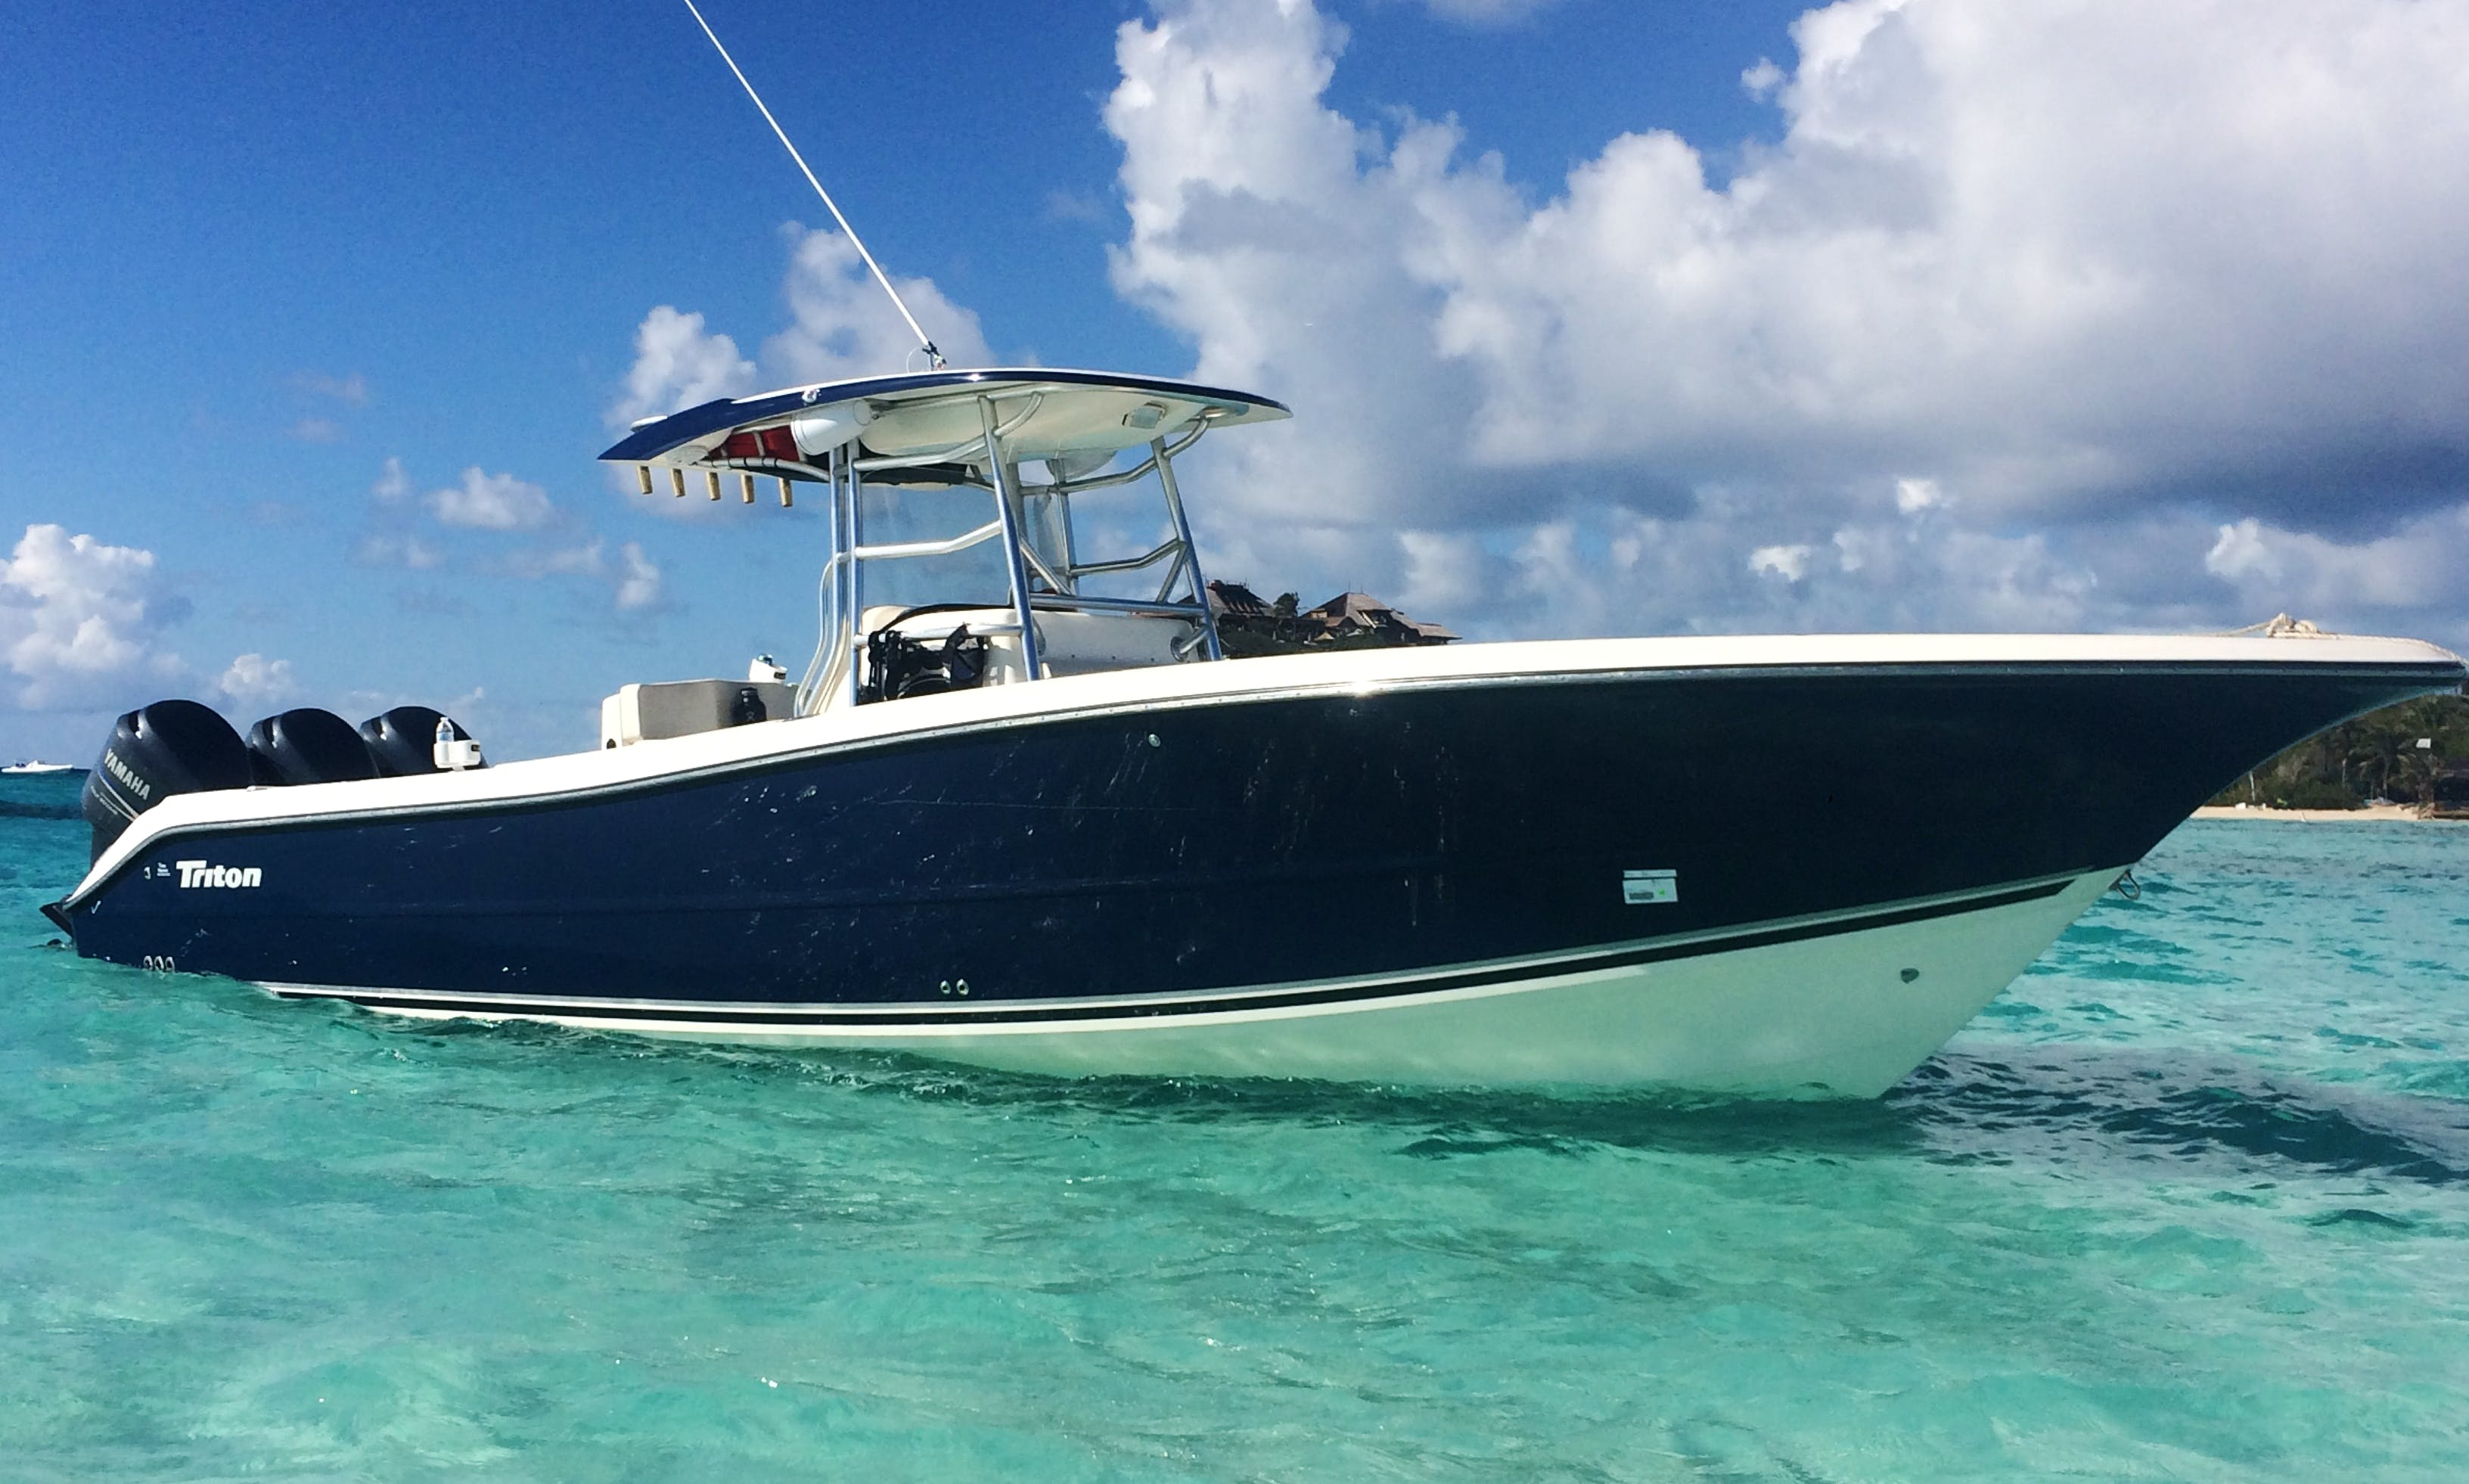 Center Console luxury boat rental in St. Thomas & St, John US Virgin islands